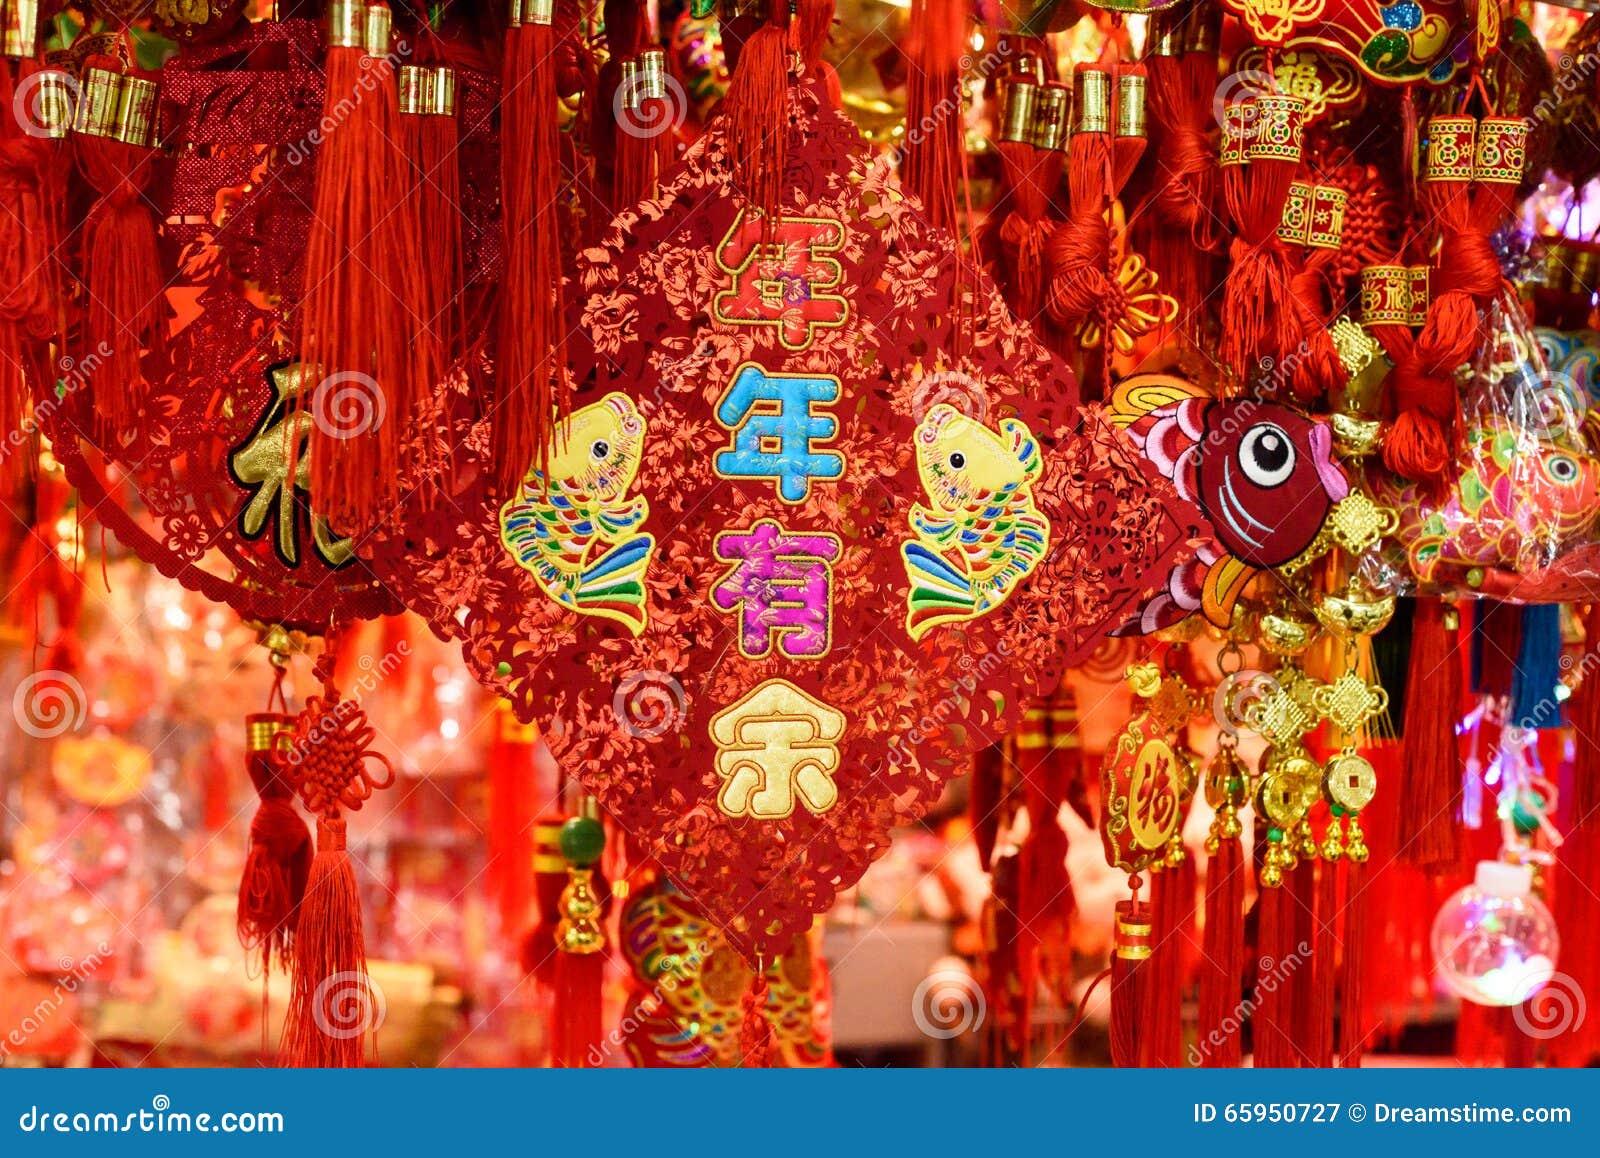 Traditional chinese new year decorations stock image image of traditional chinese new year decorations buycottarizona Images